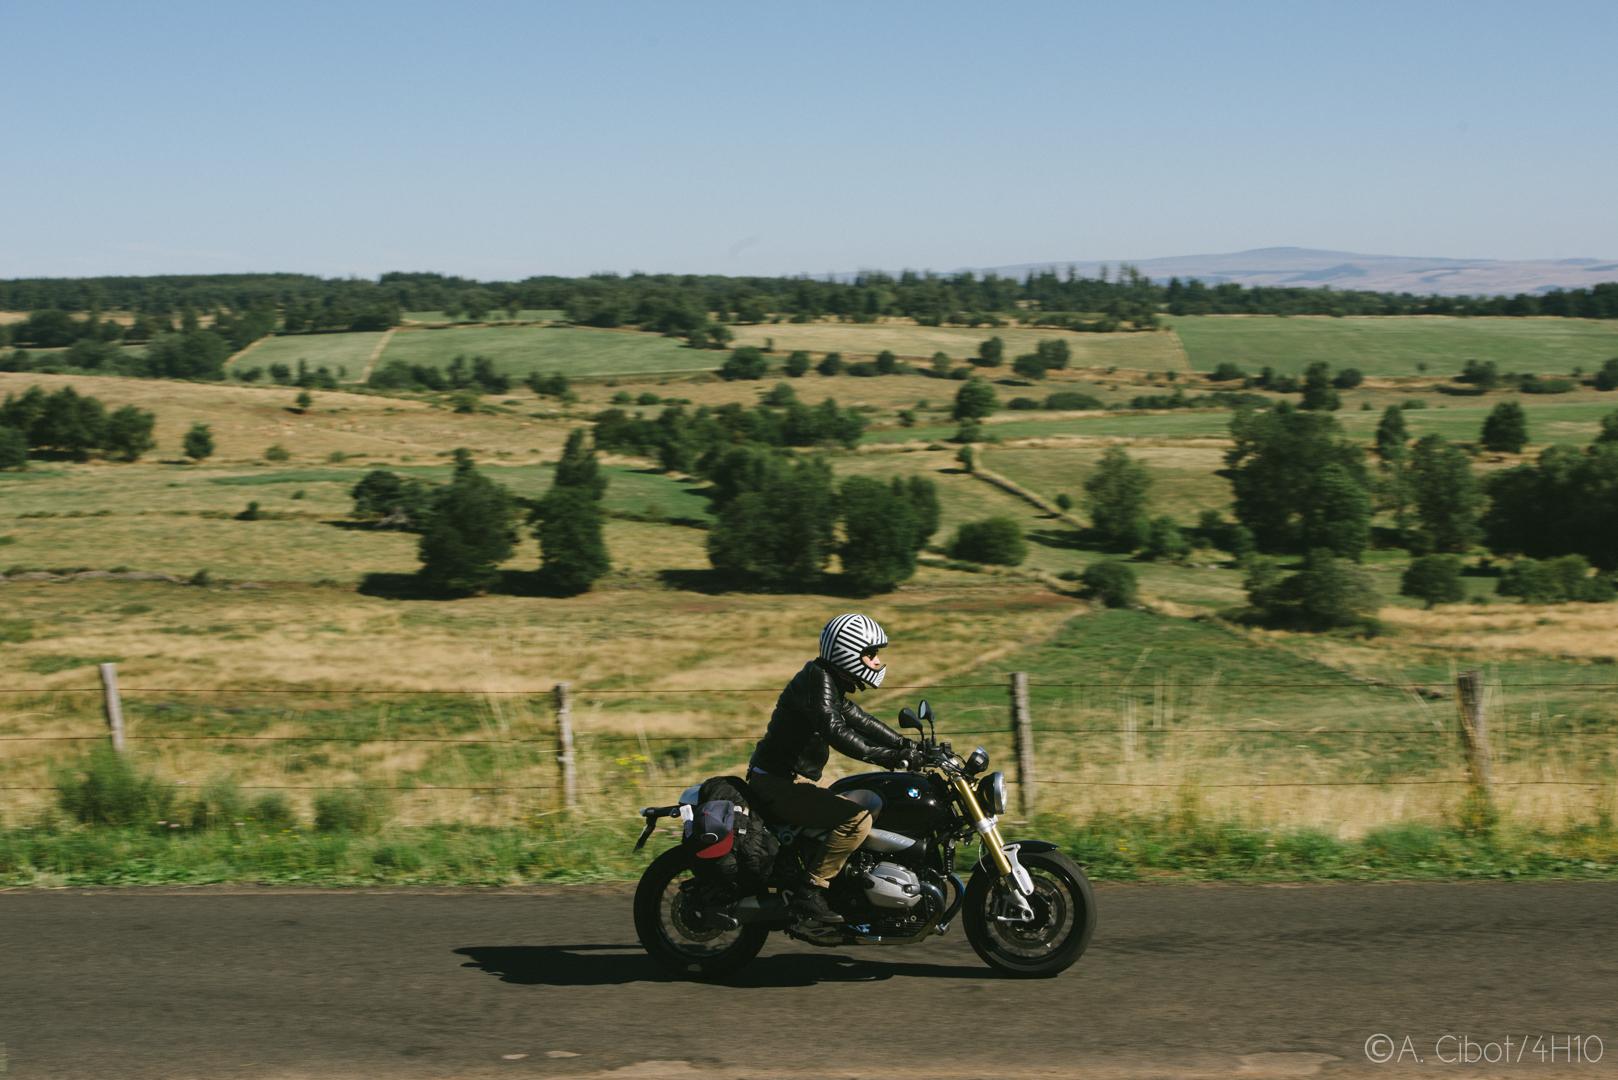 ac_moto_road_trip_4h10_26082016_0382